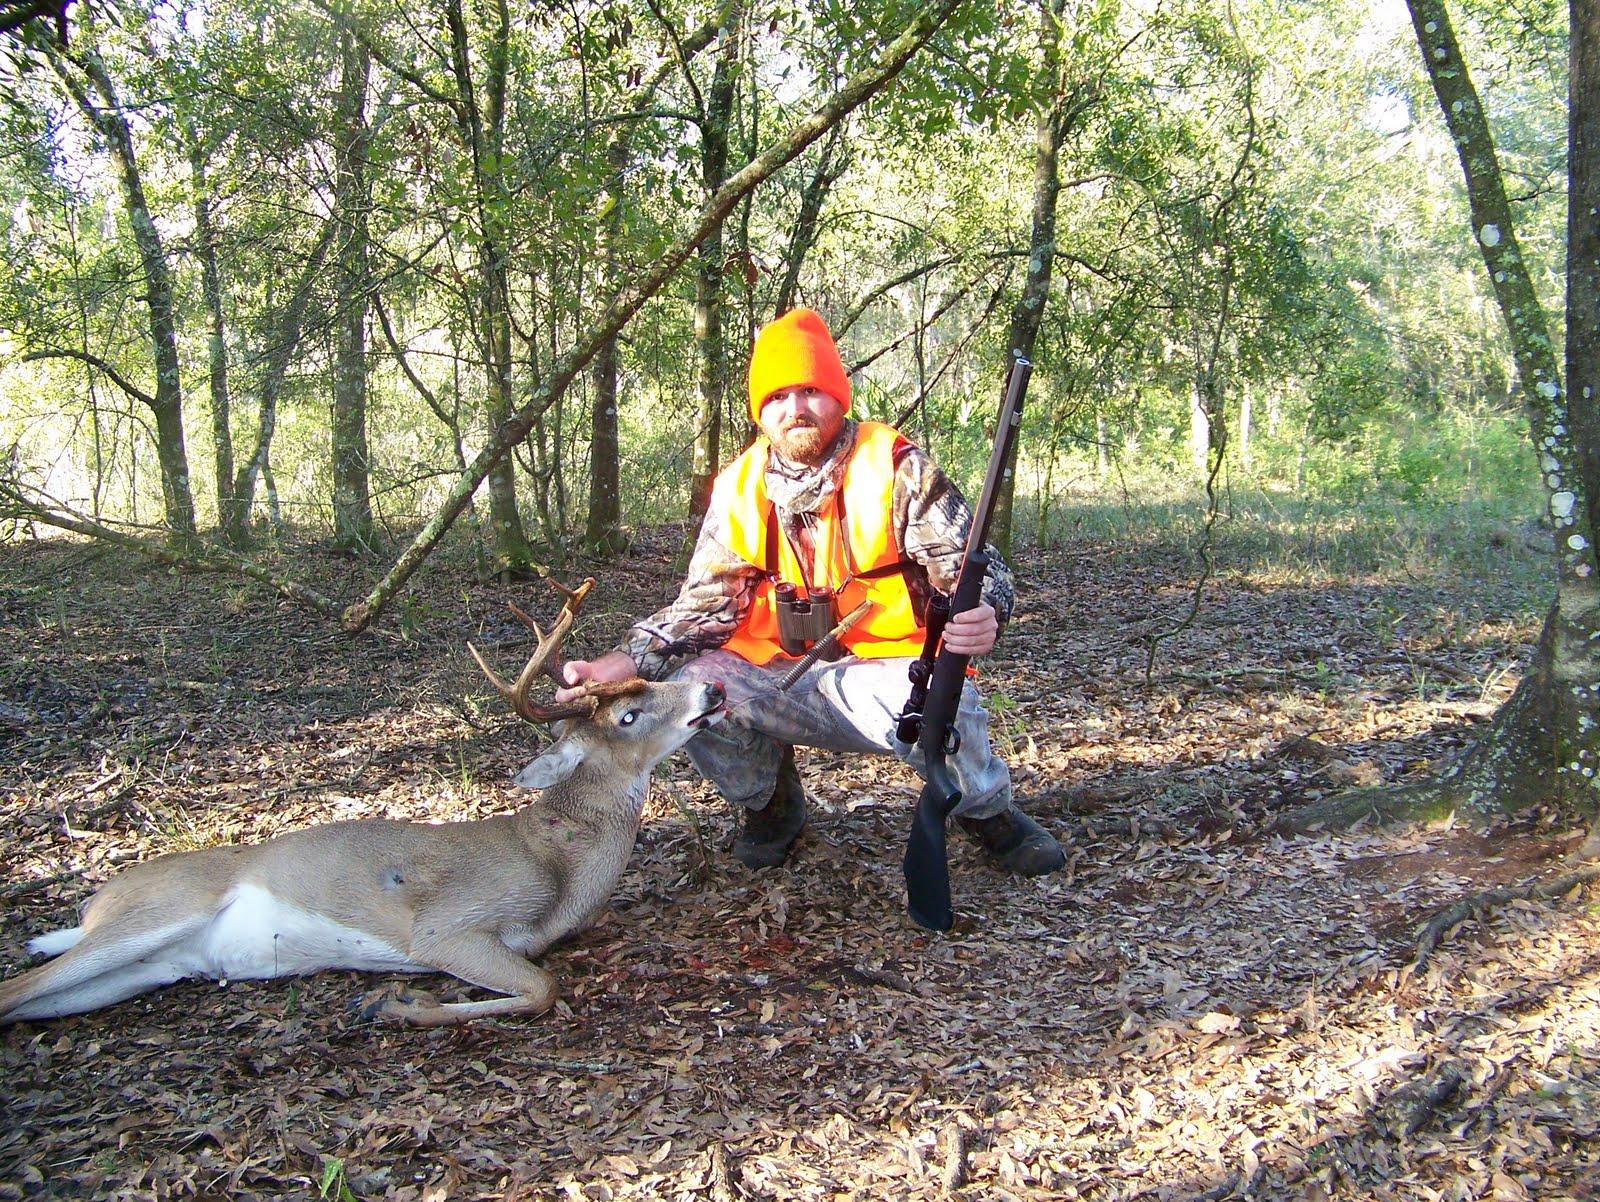 all buck deer image feeder topics feeders linked works it ubbthreads still boss